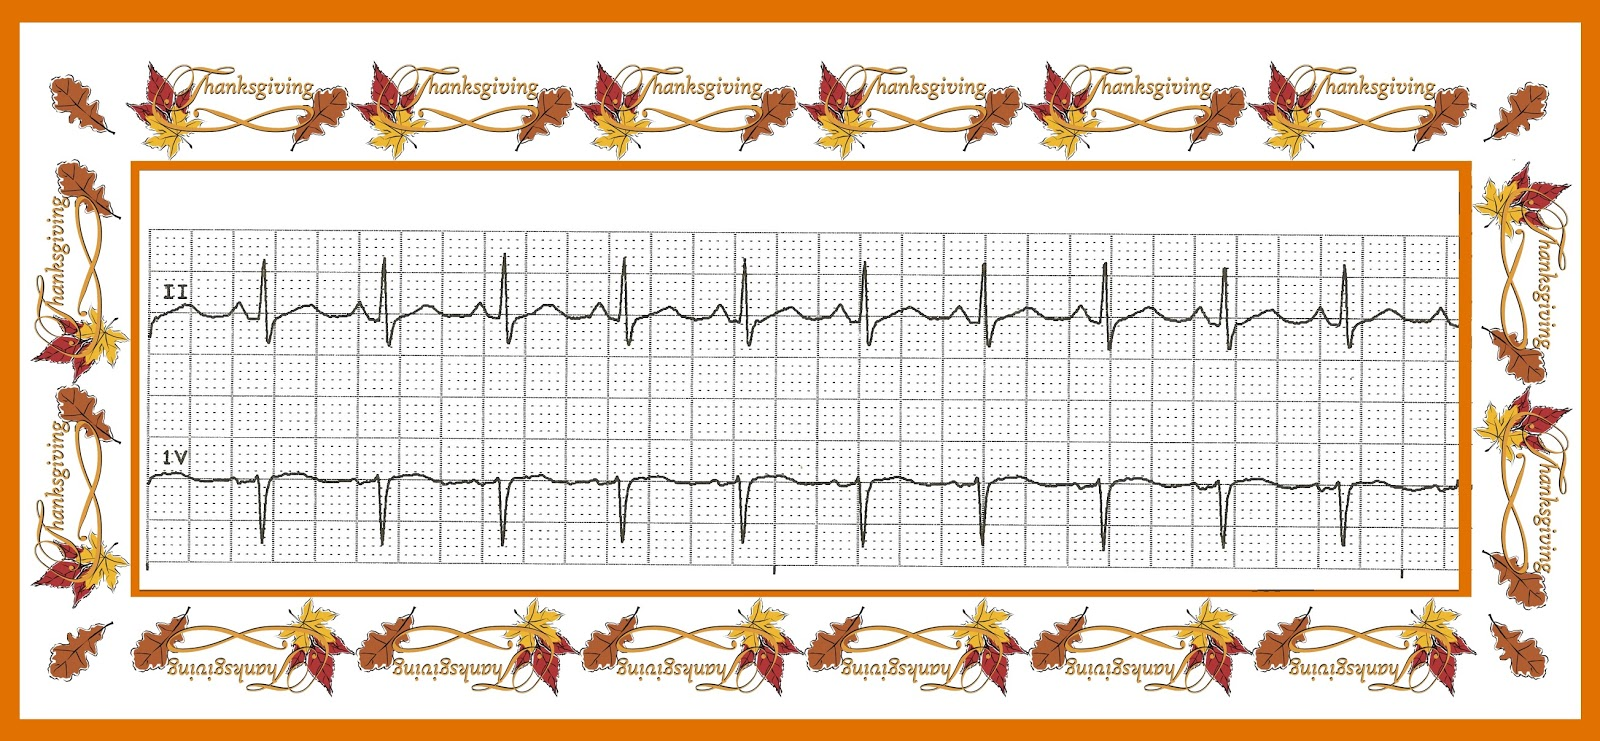 Telemetry technician course ekg practice quiz 02 identify the following rhythm xflitez Choice Image